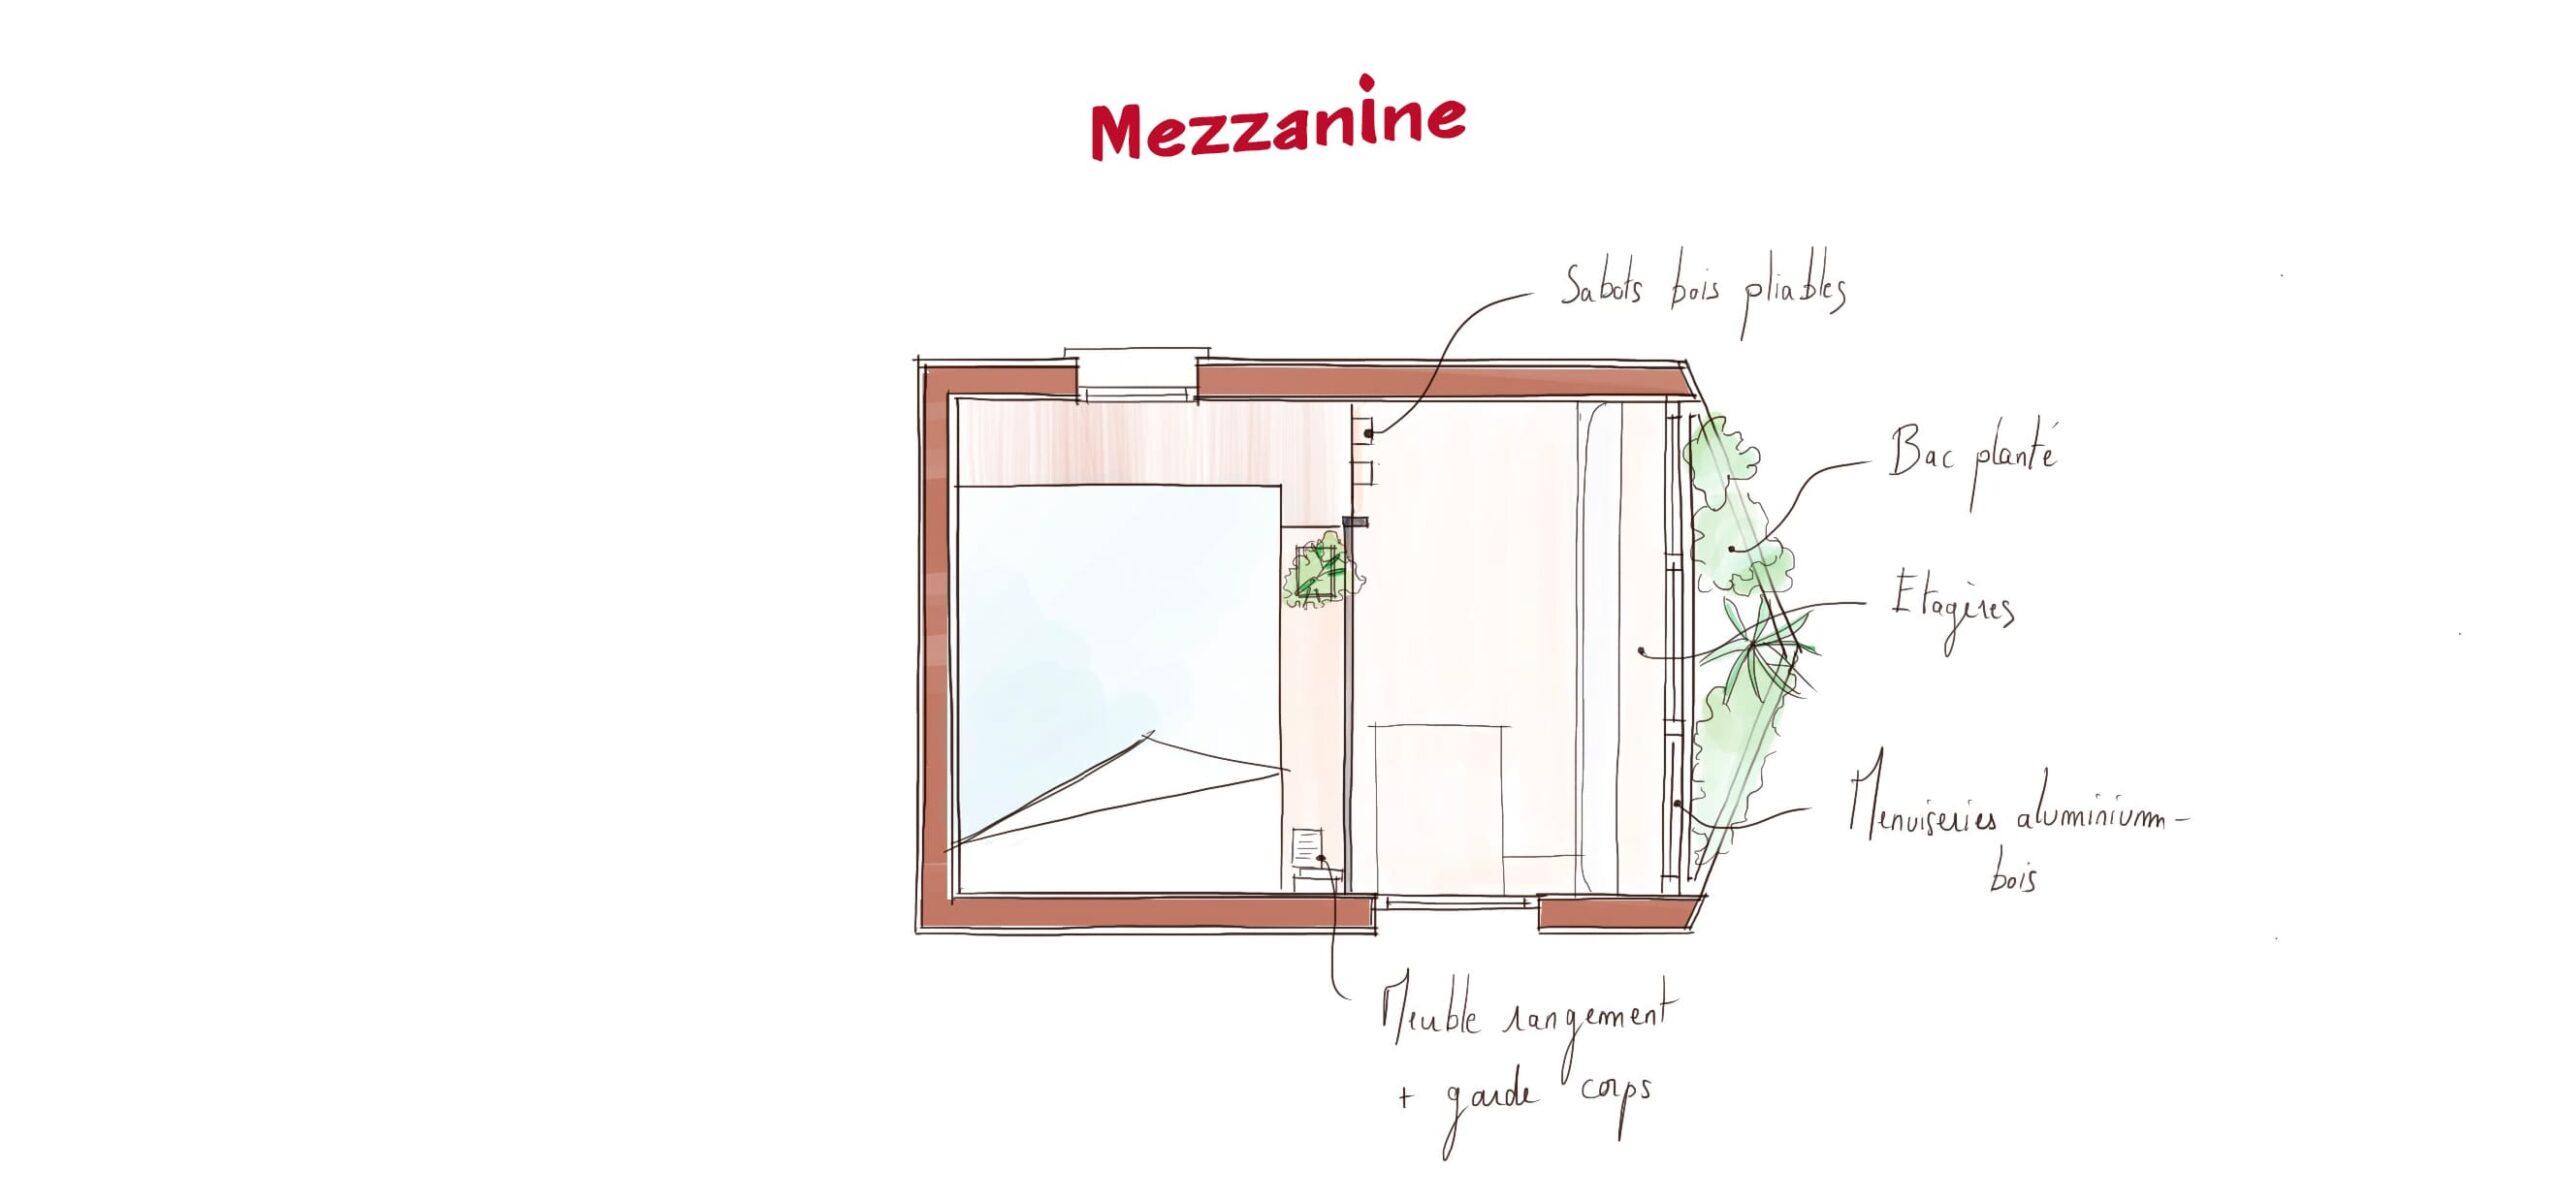 tiny-house-particulier-mini-mezzanine